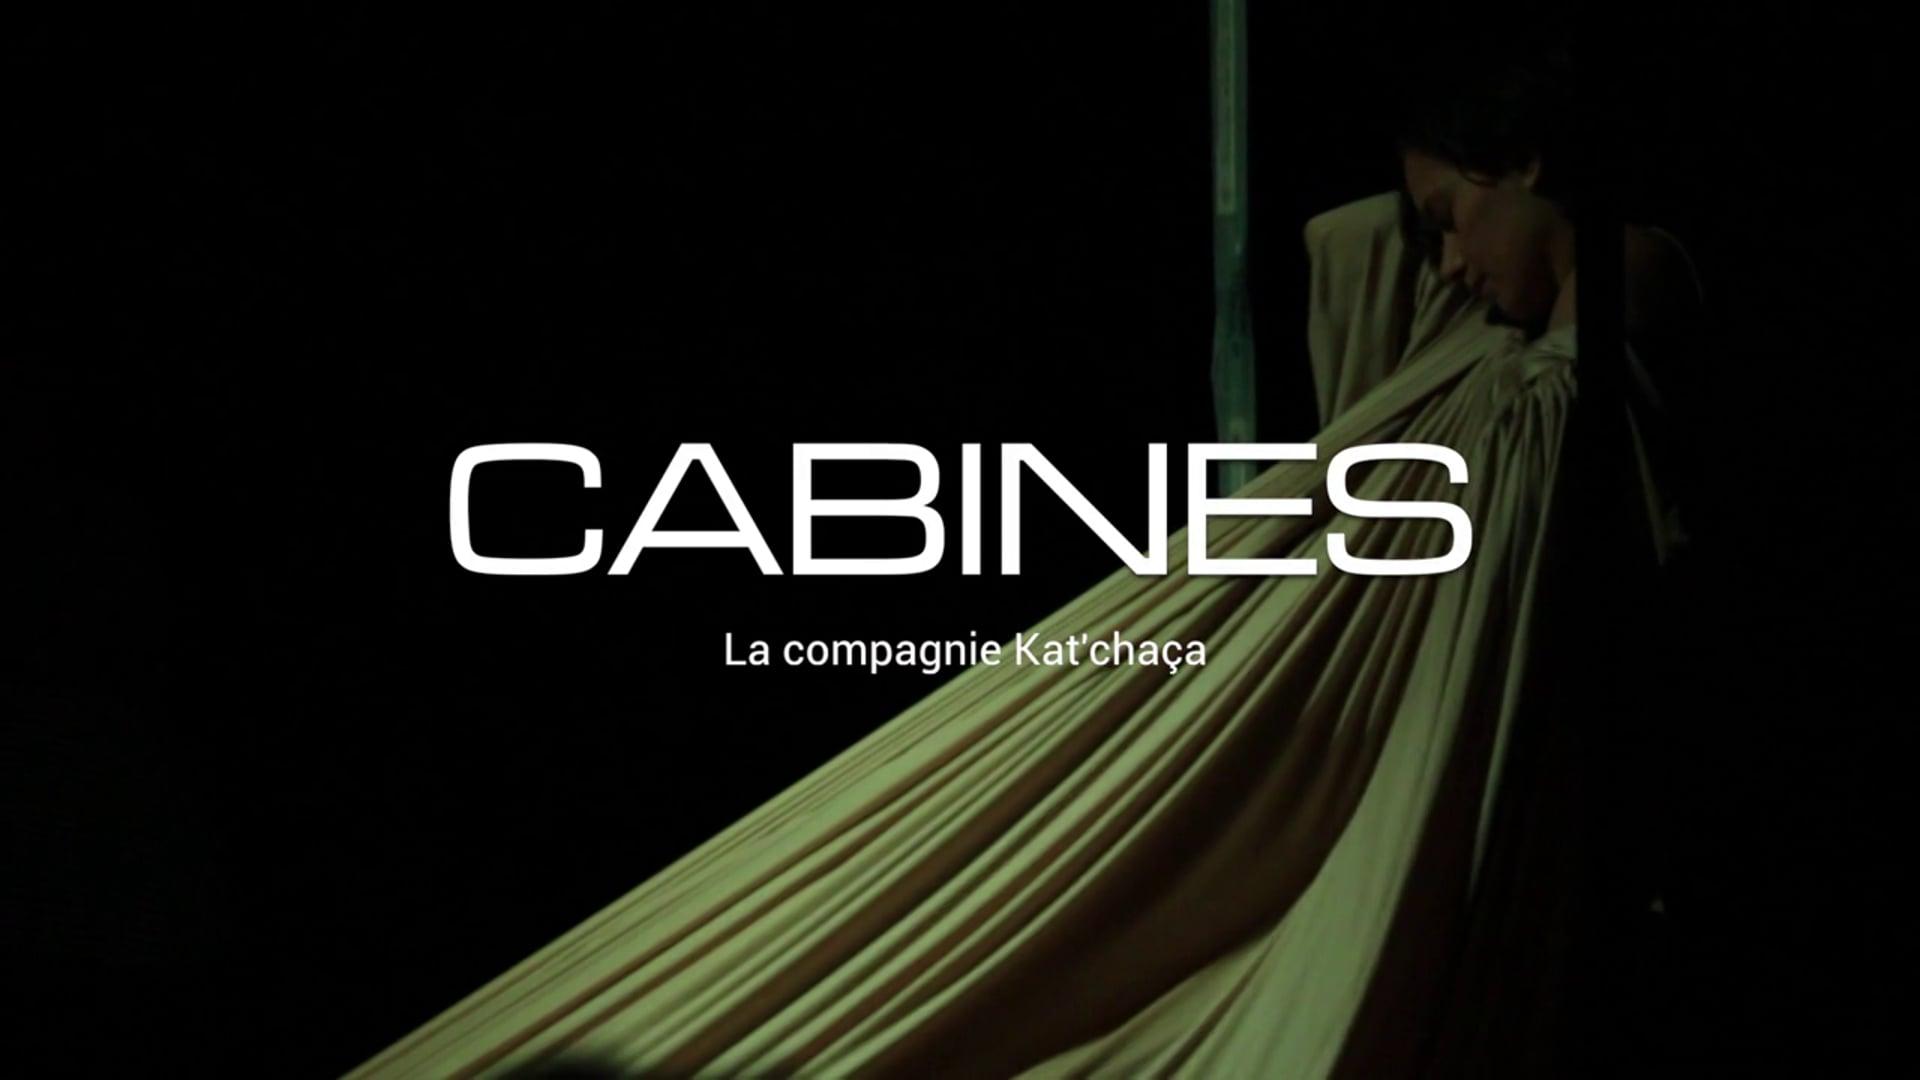 Natacha Paquignon - Cabines 2 - Interview & extraits